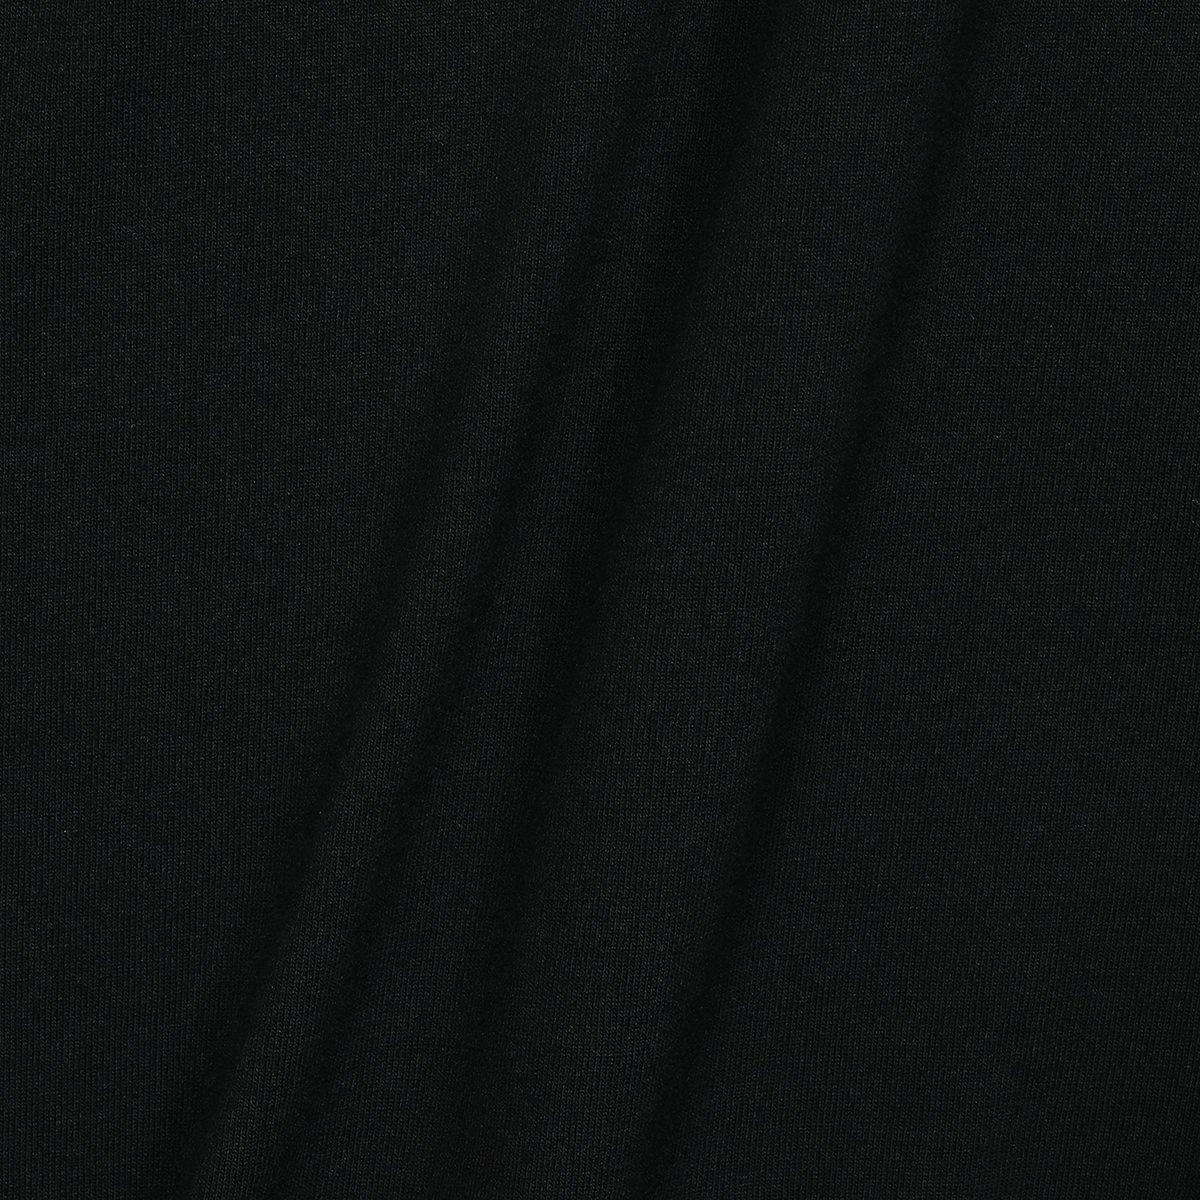 Short Sleeve RIB T-shirts 詳細画像24